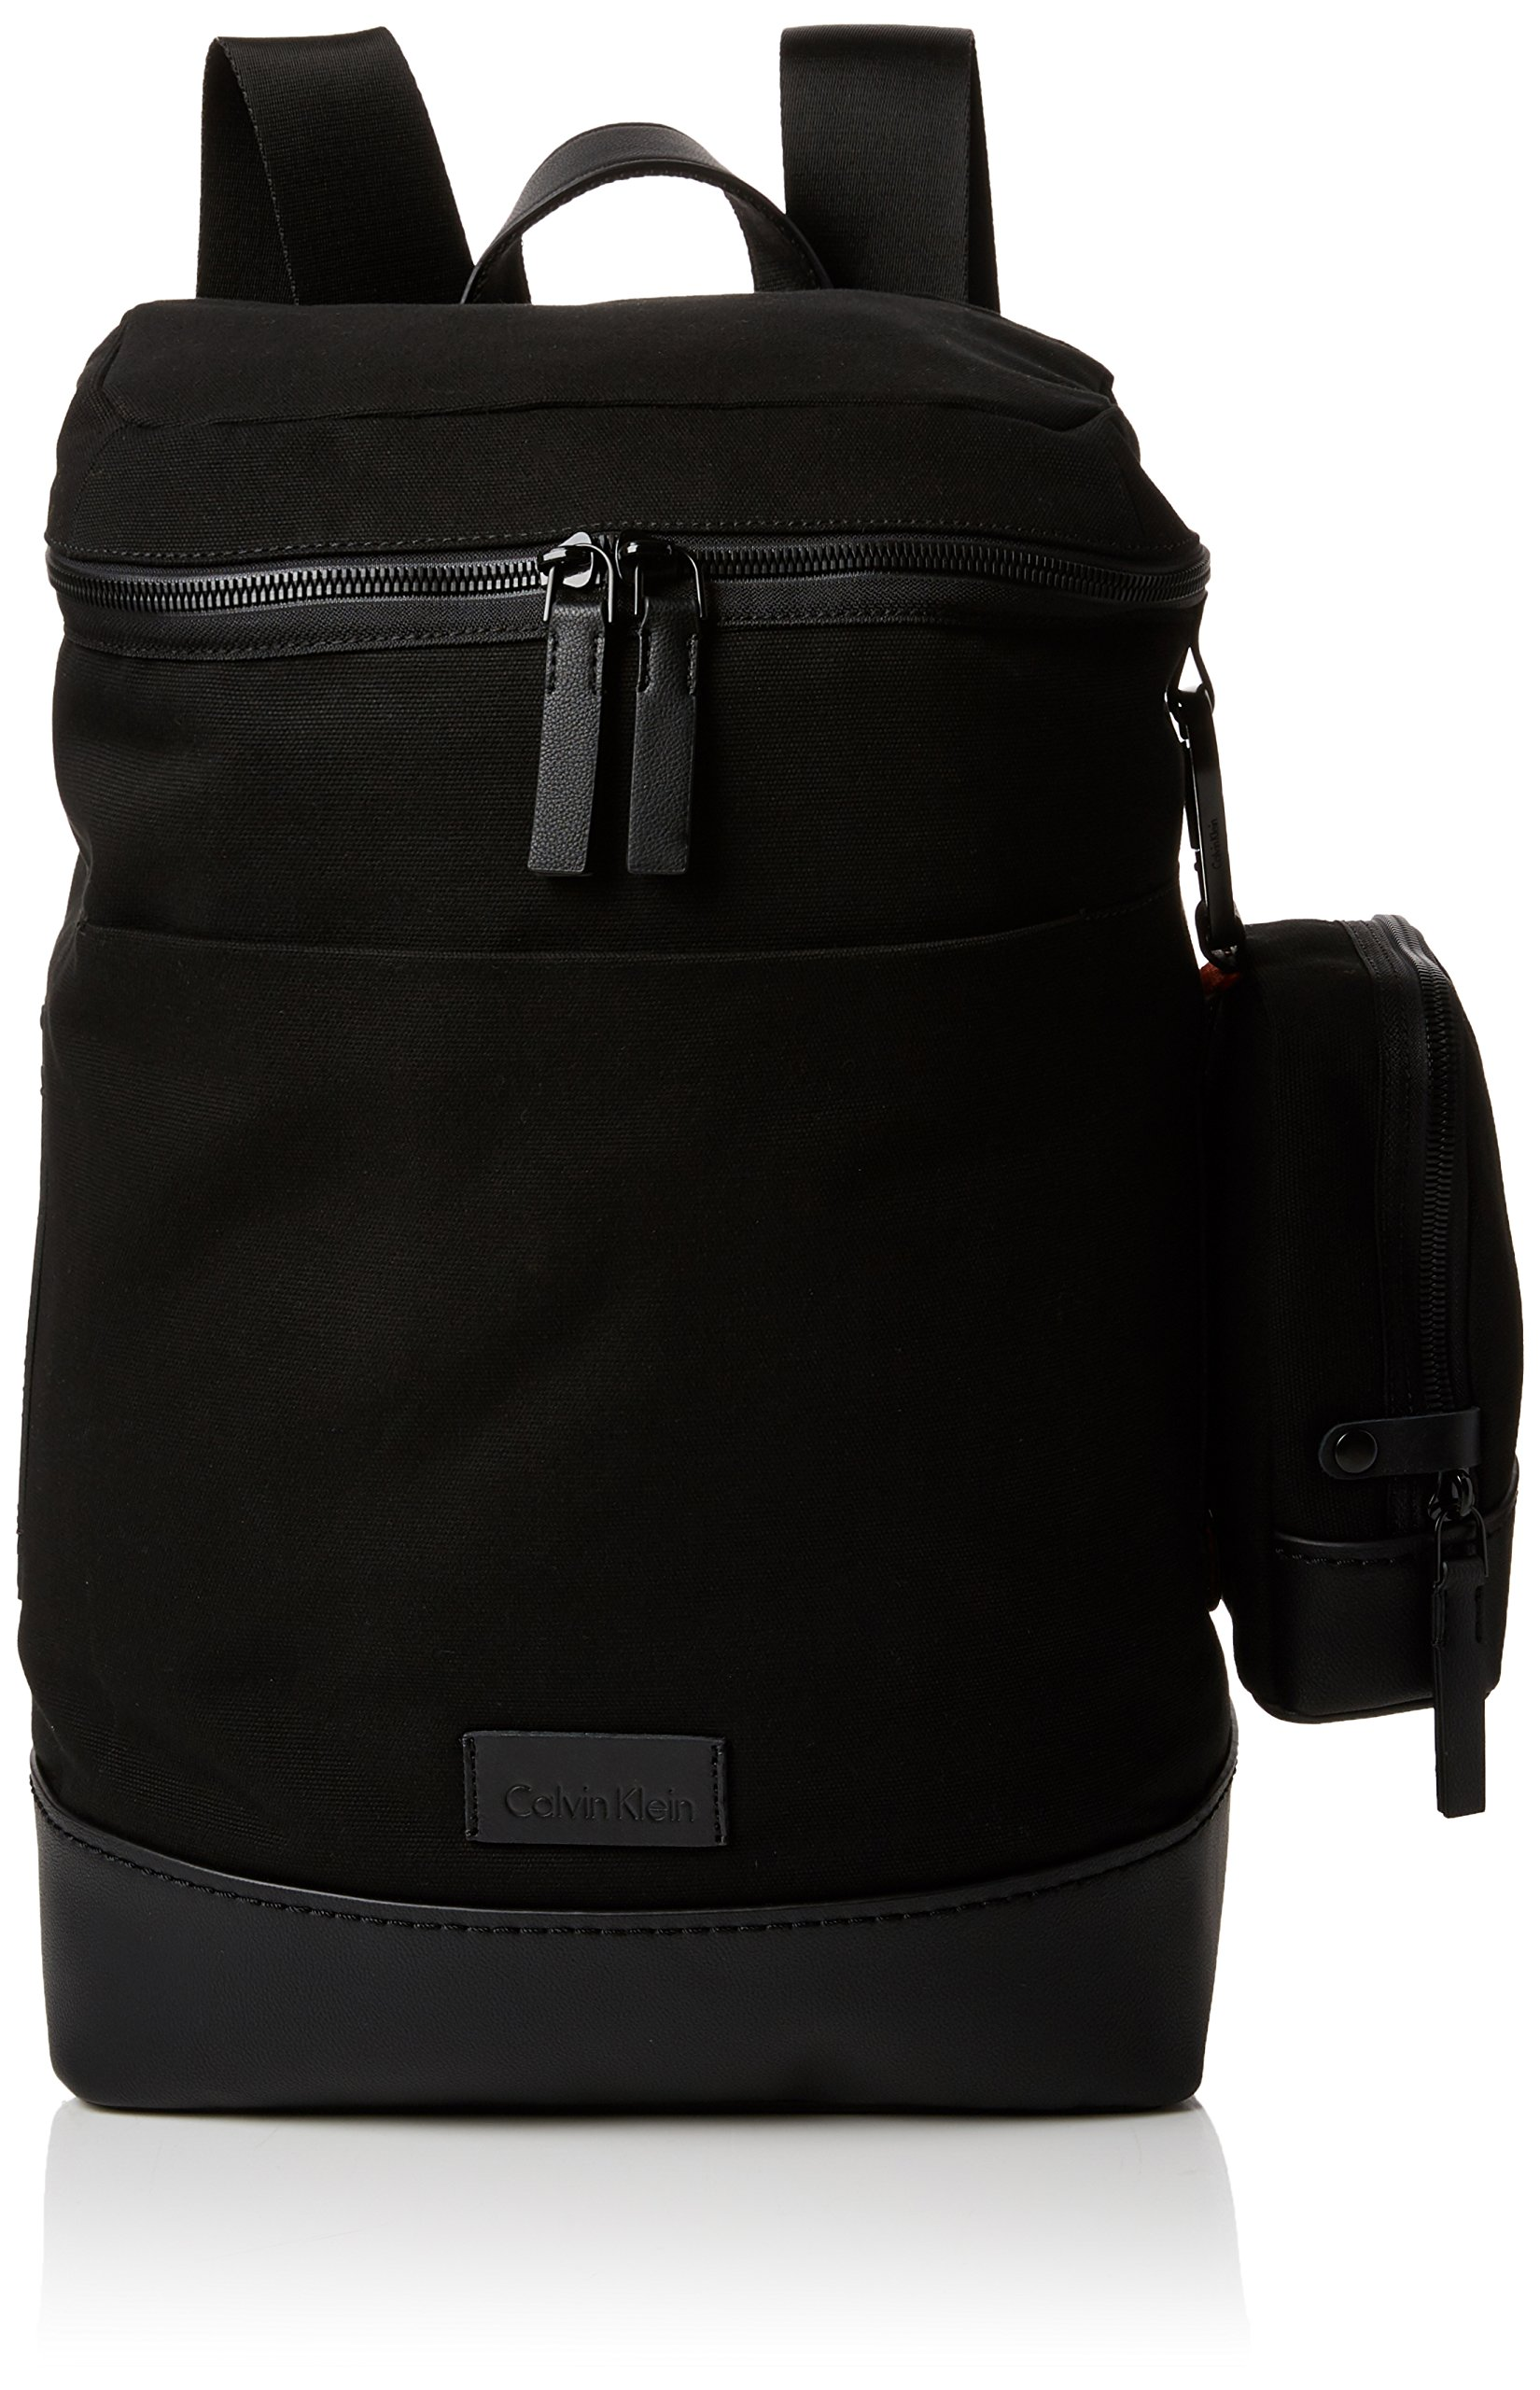 Calvin Dos Fashion HommeNoirblack20x53x35 Cmb Klein BackpackSacs T X H Modern Bound À UzVLMpGqS